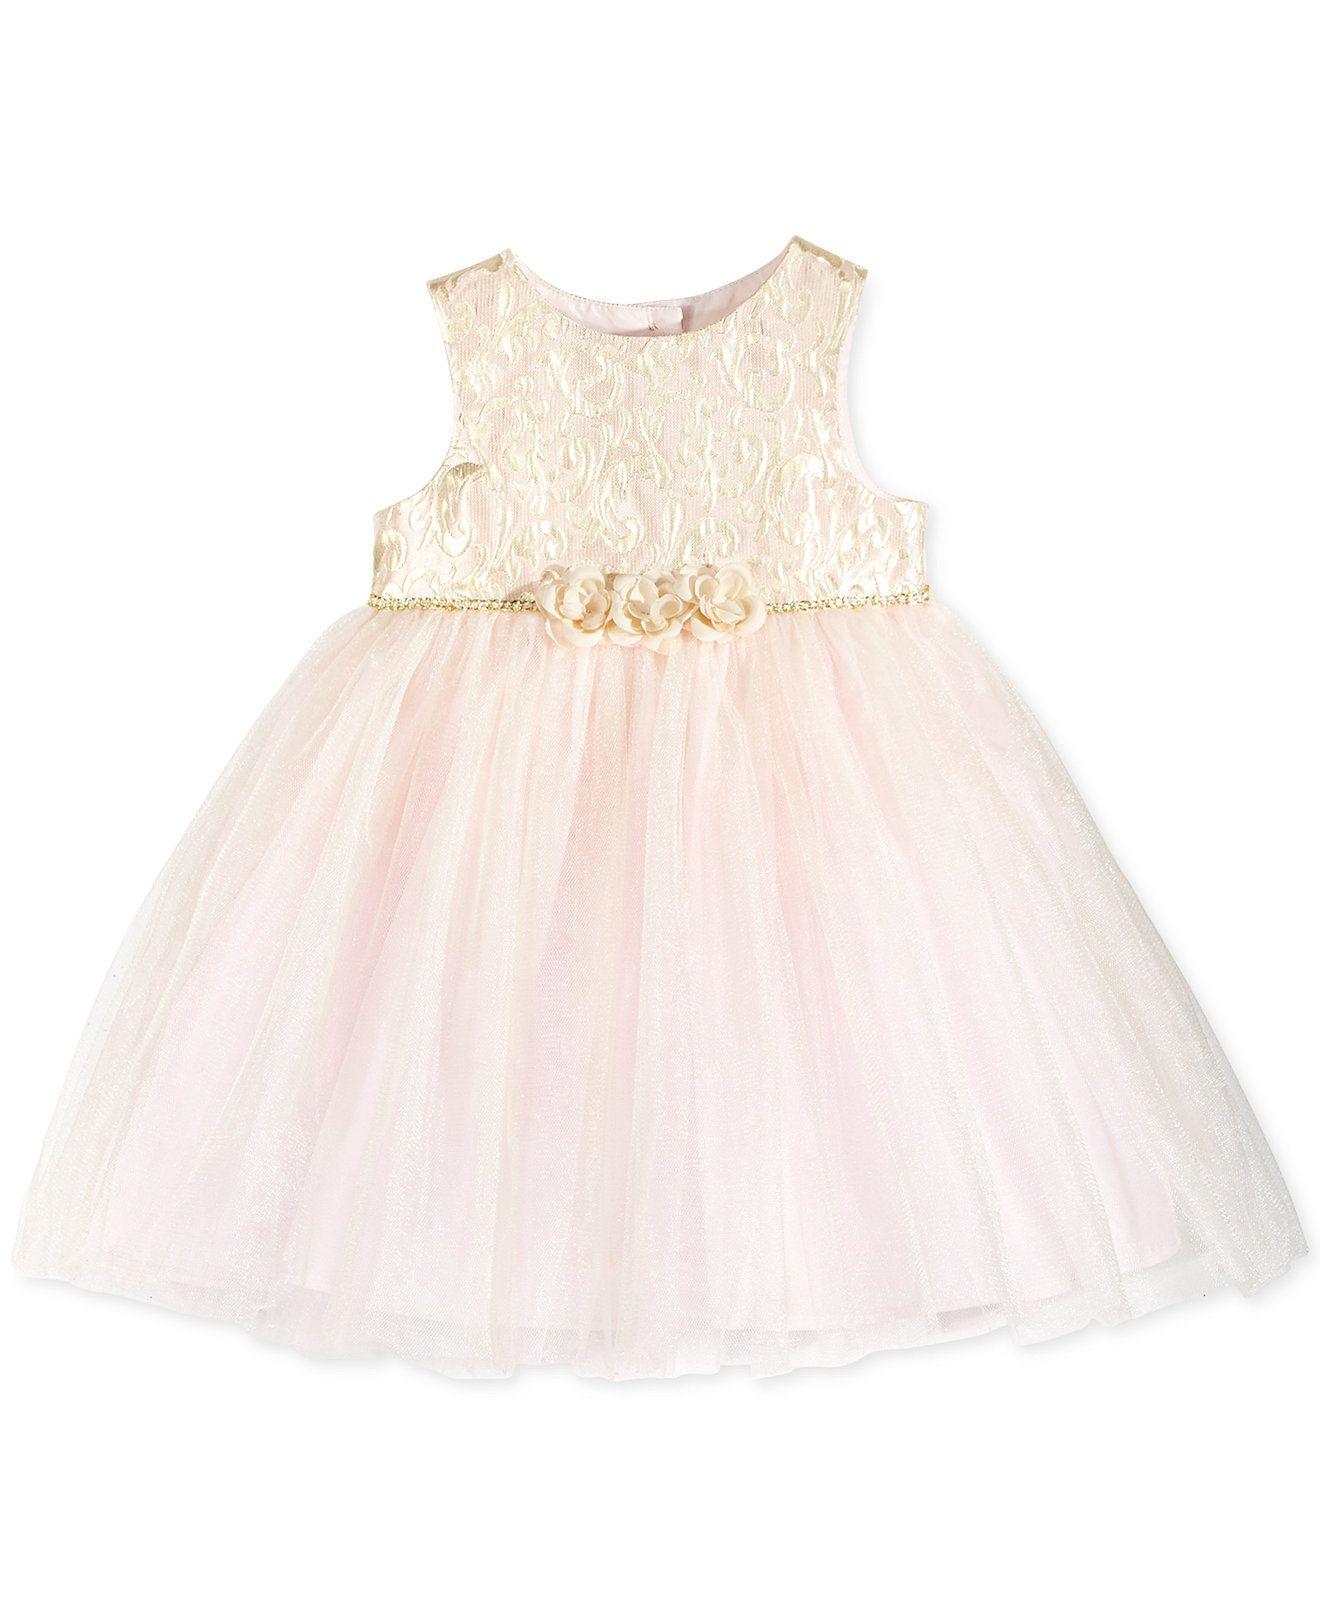 Marmellata Baby Girls Pink & Gold Brocade Dress Baby Girl 0 24